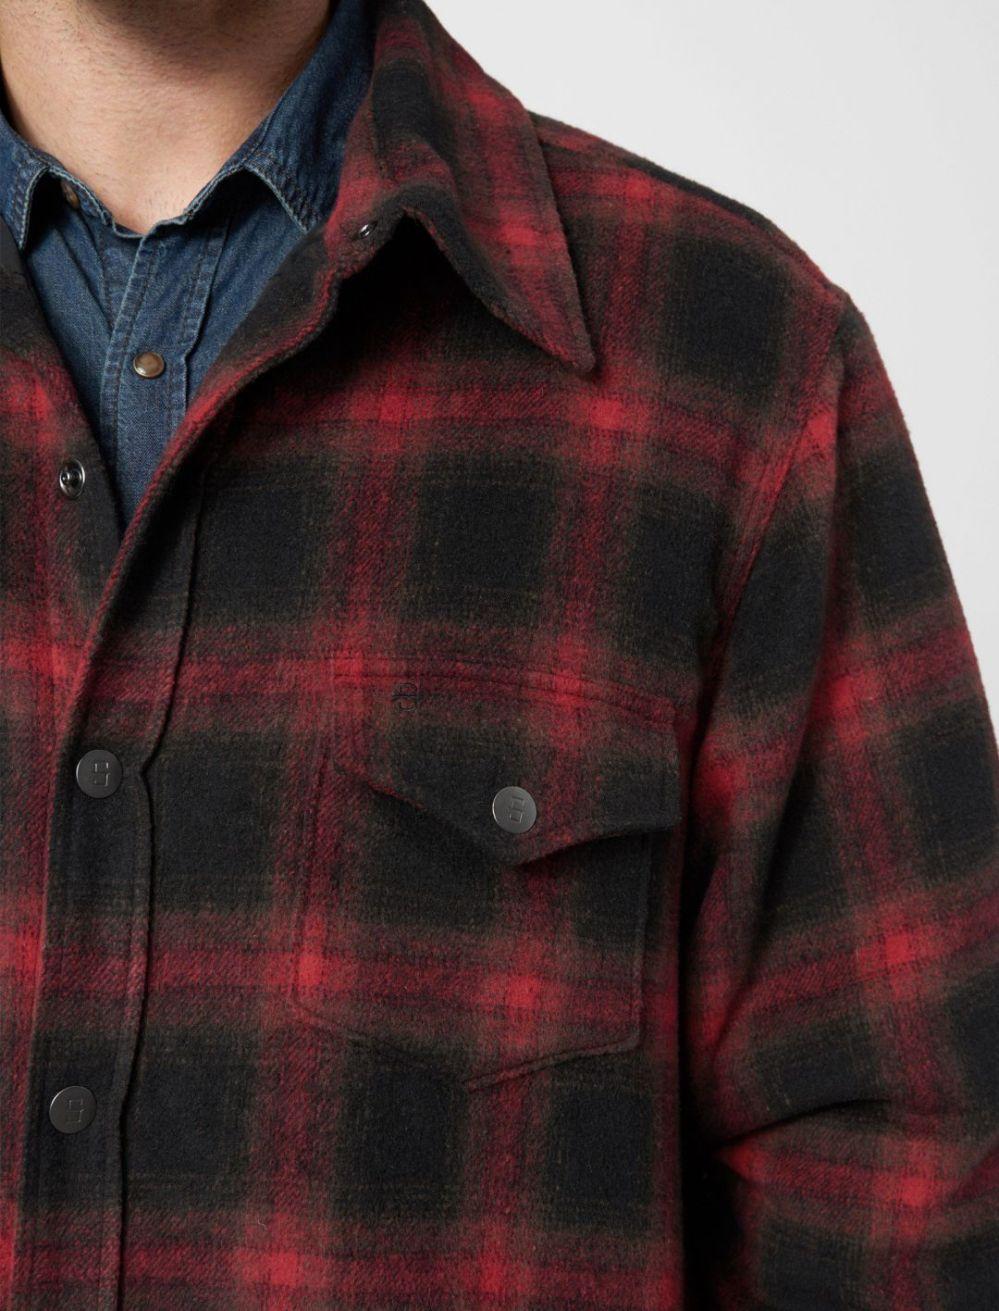 Snap Button Shirt of the Day: Stetson - Wool Blend Shirt Jacket